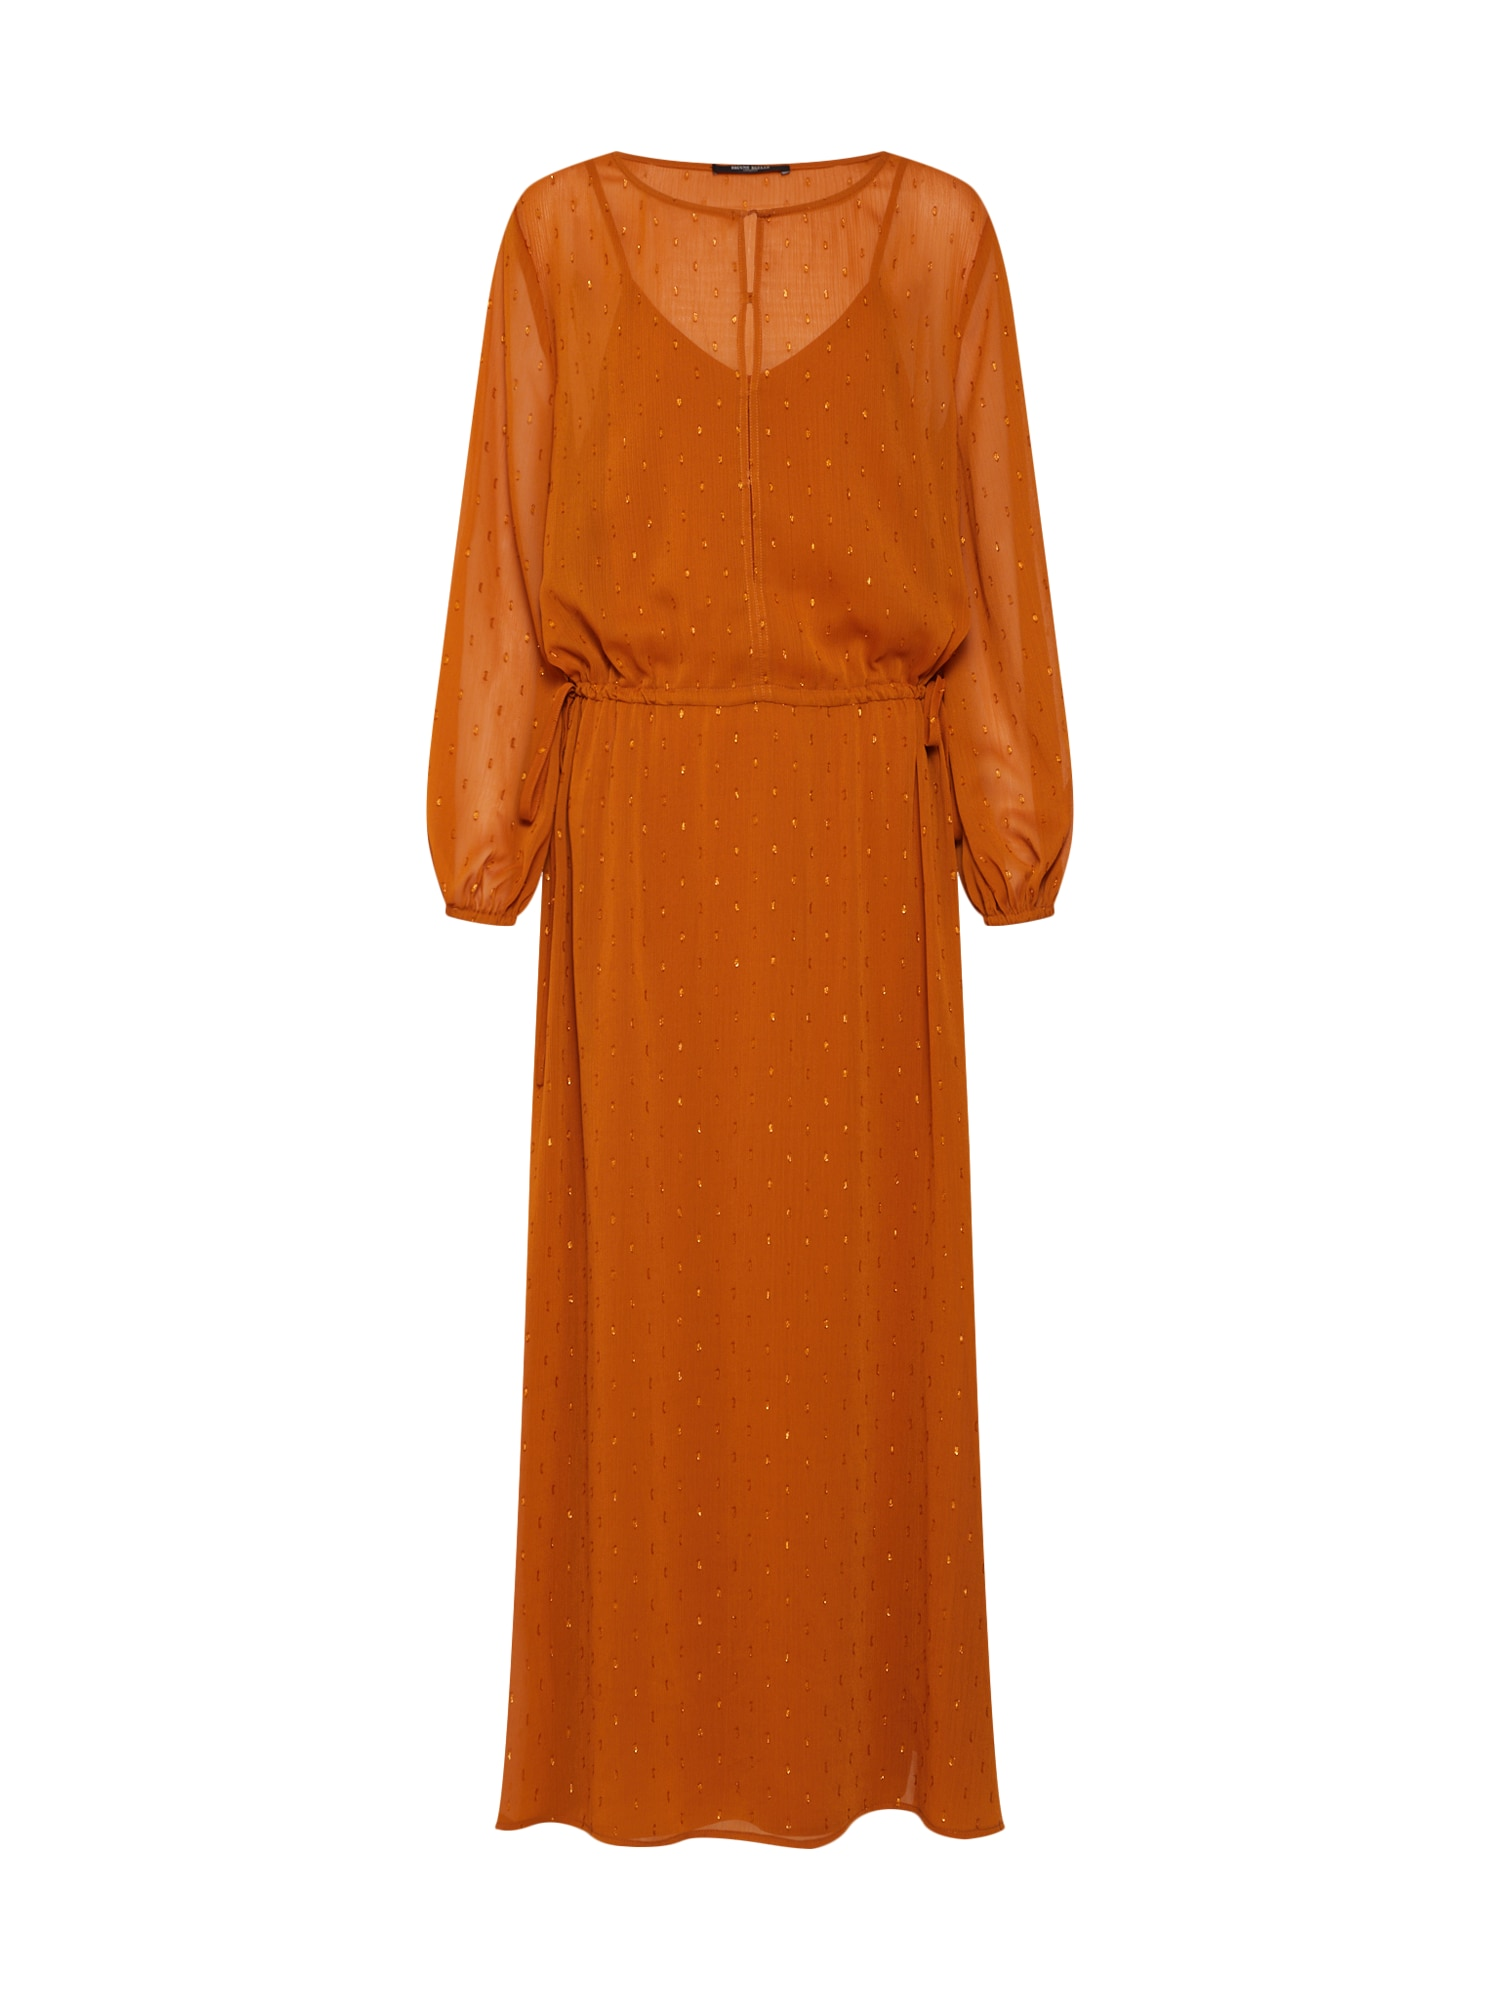 Šaty Mariah Gloria oranžová BRUUNS BAZAAR